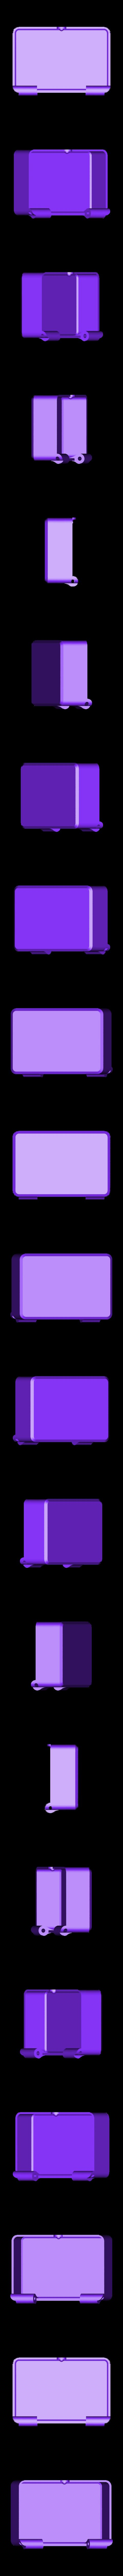 CR2032_case_2.stl Download free STL file CR2032, LR44, AG13 Coin Battery Case • 3D printable object, parkgwansu339